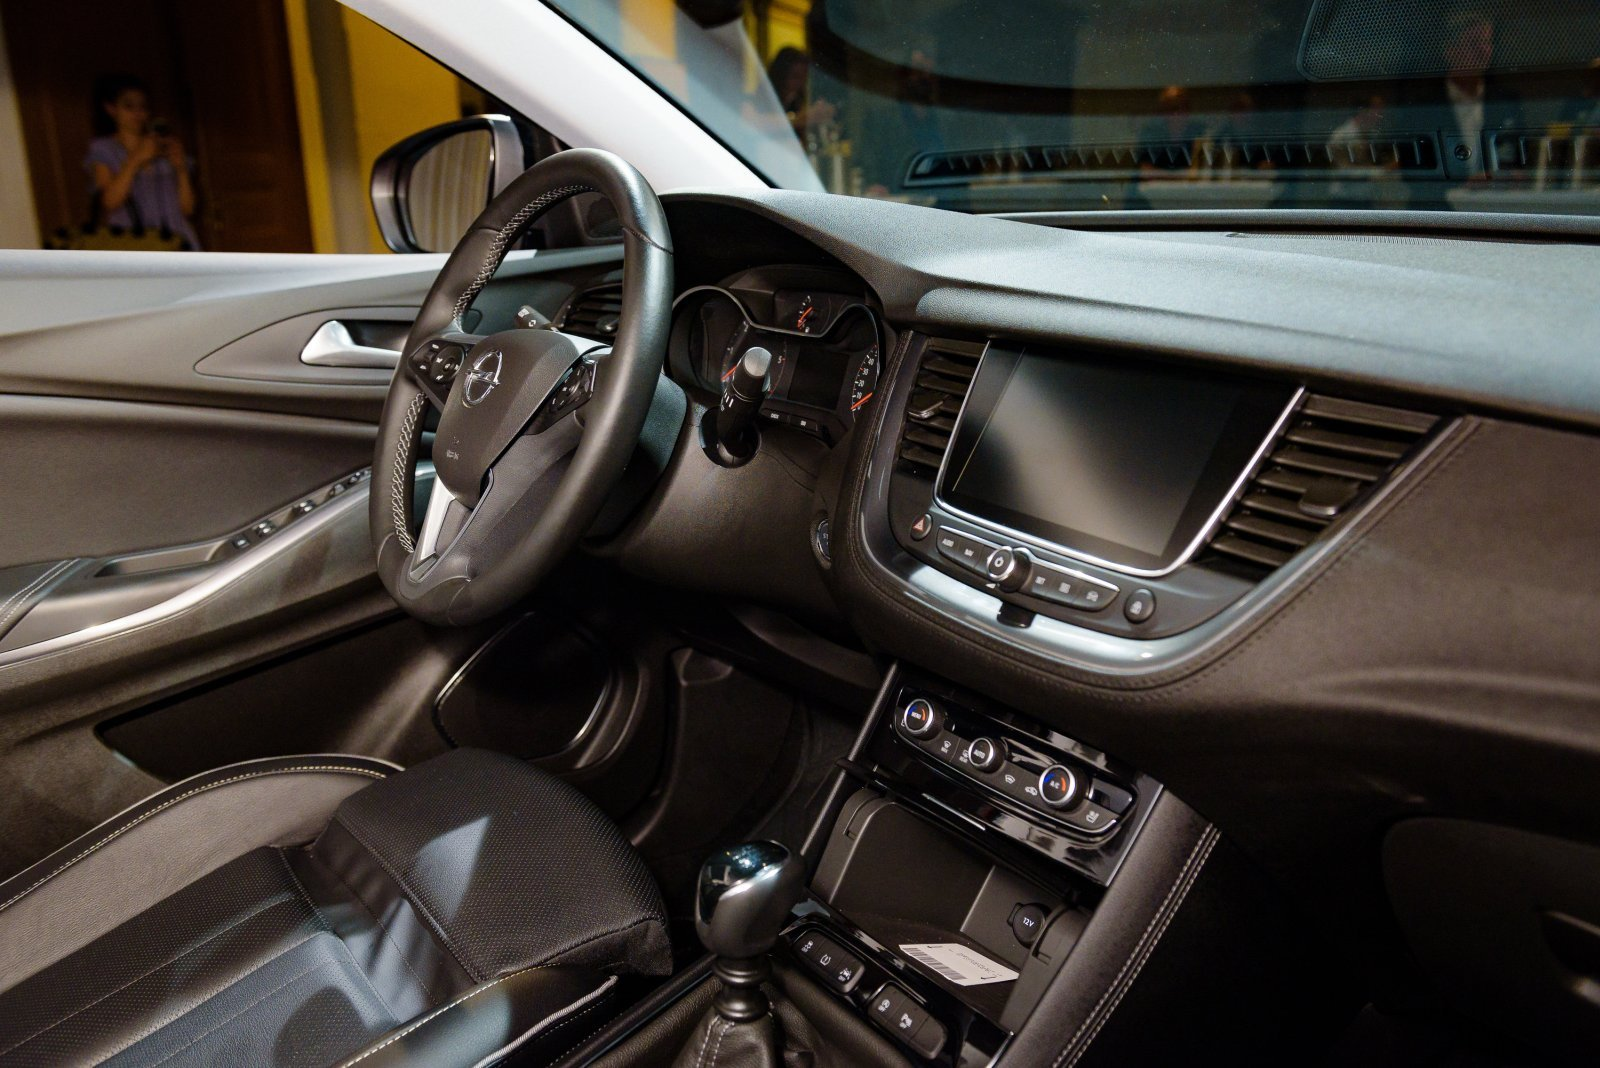 Opel grandland x in wien enth llt alles auto for Interior opel grandland x